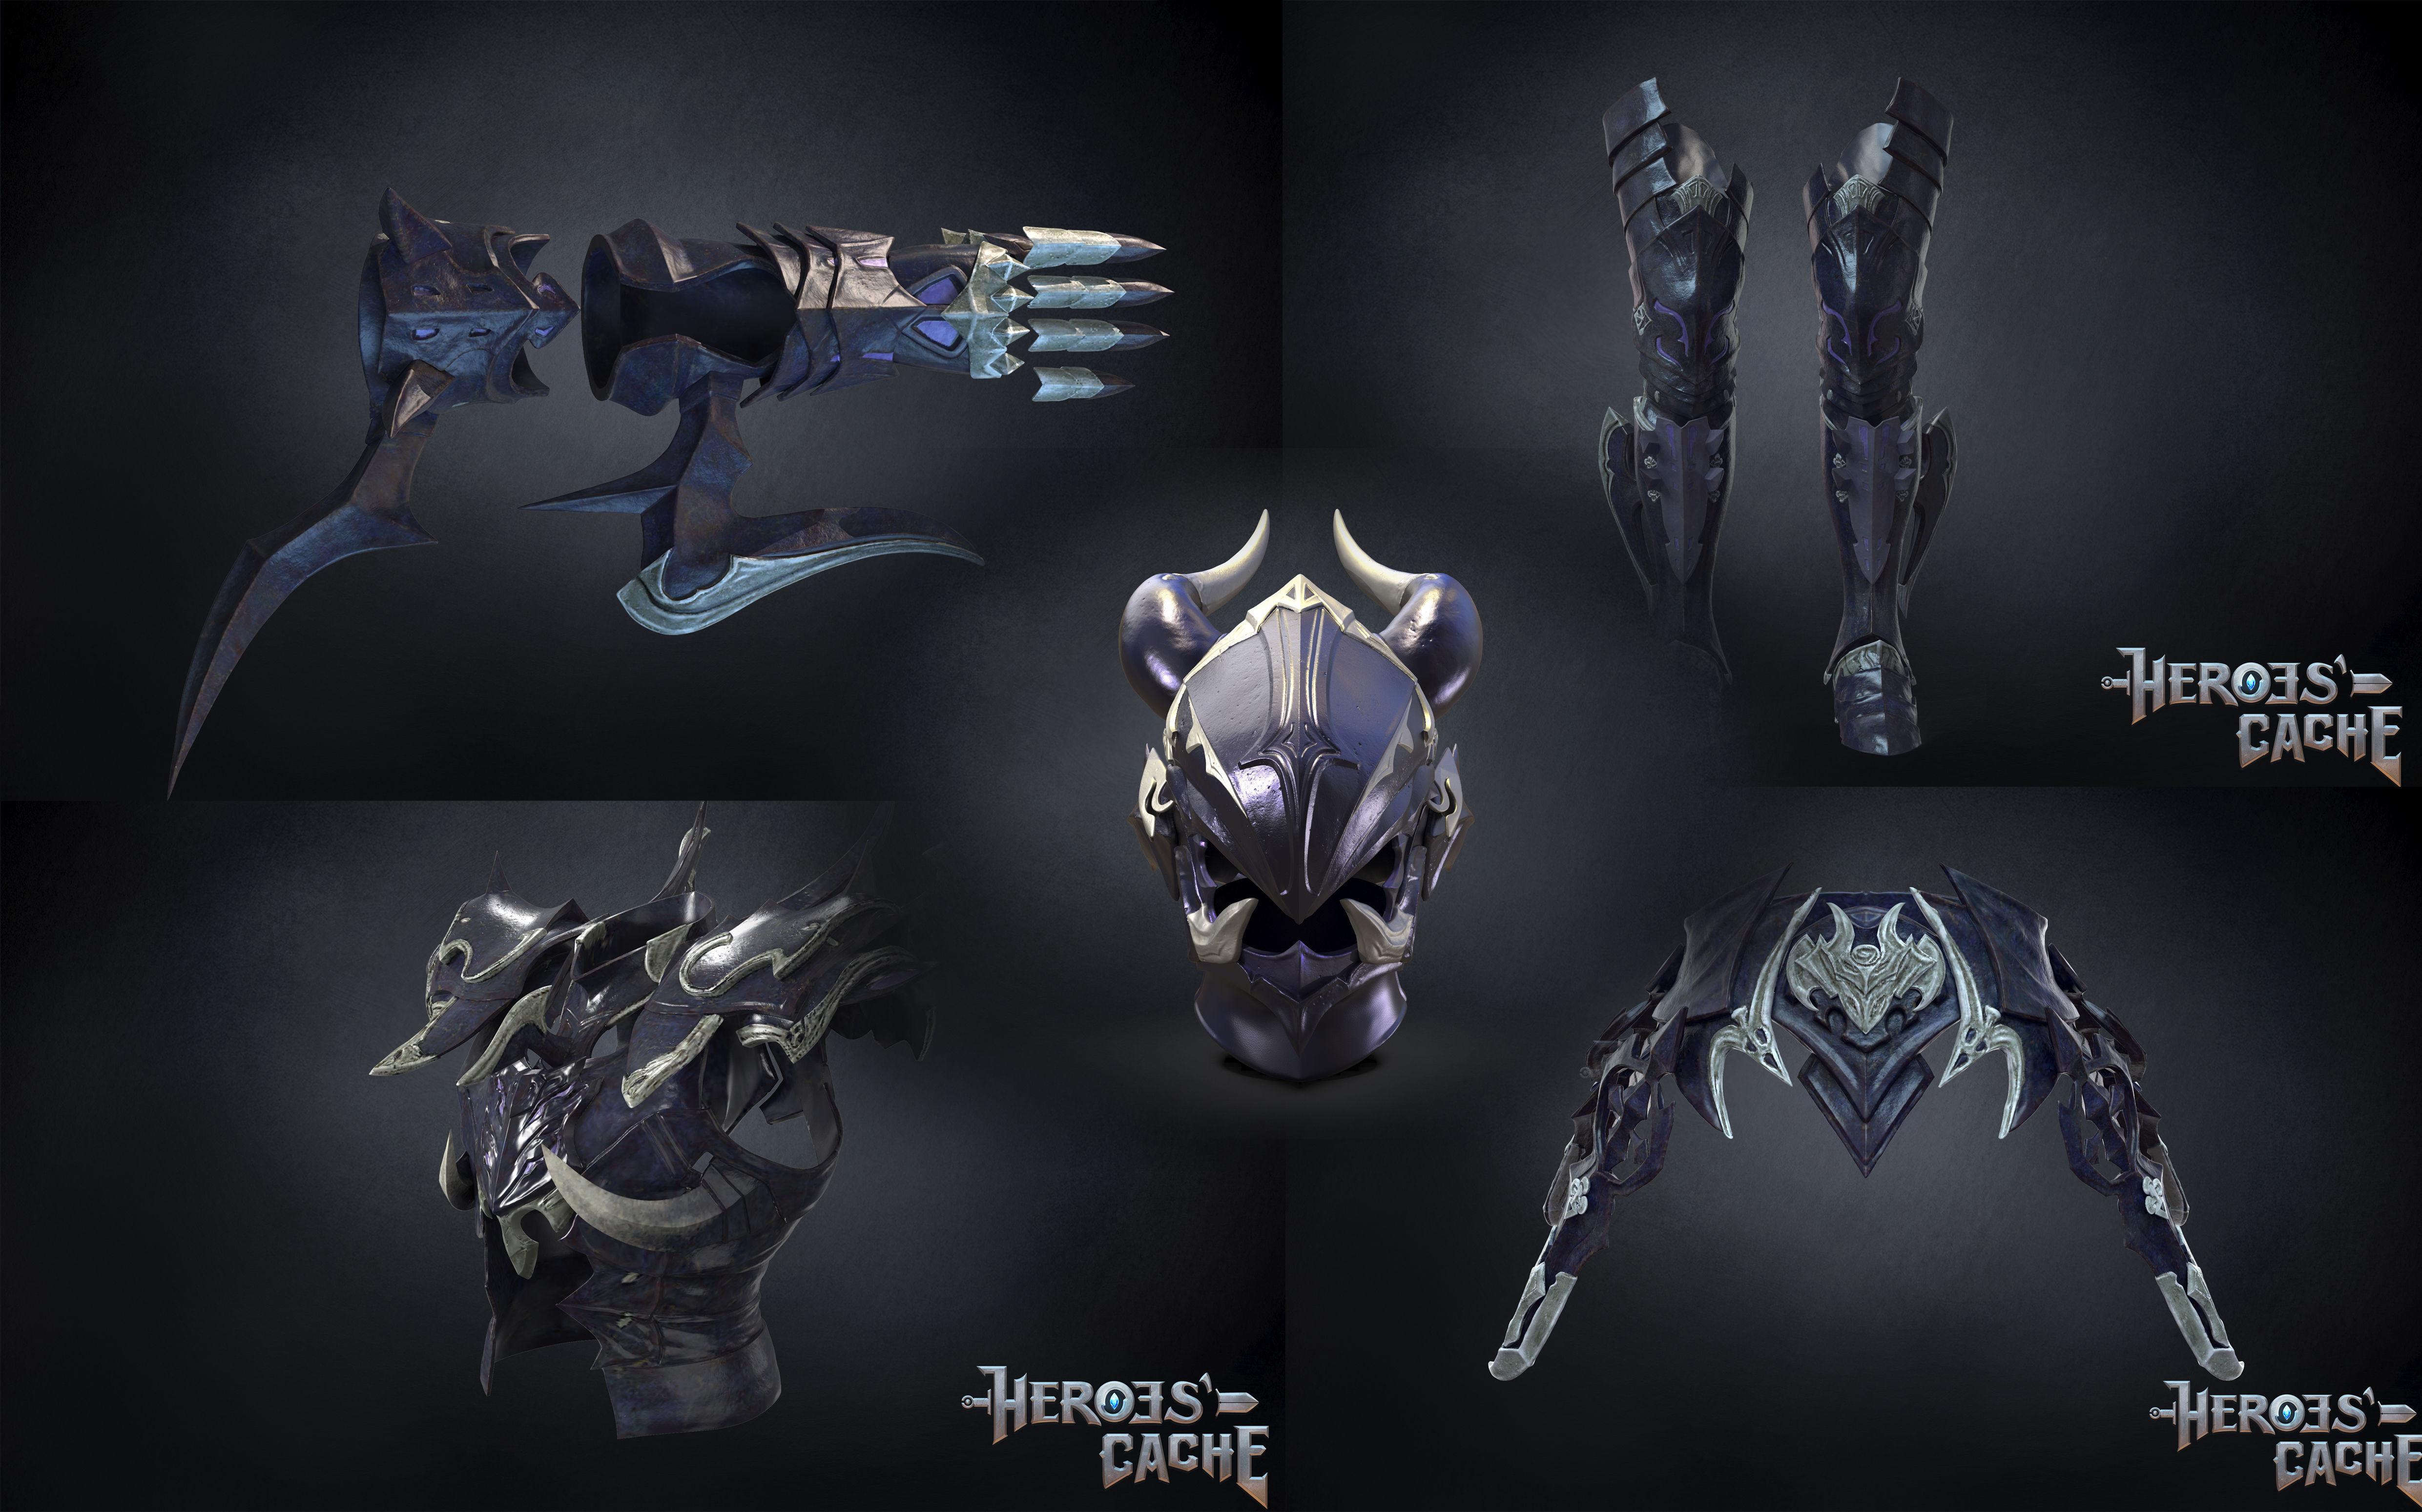 Final Fantasy XIV - Drachen Full Set plus Gae Bolg